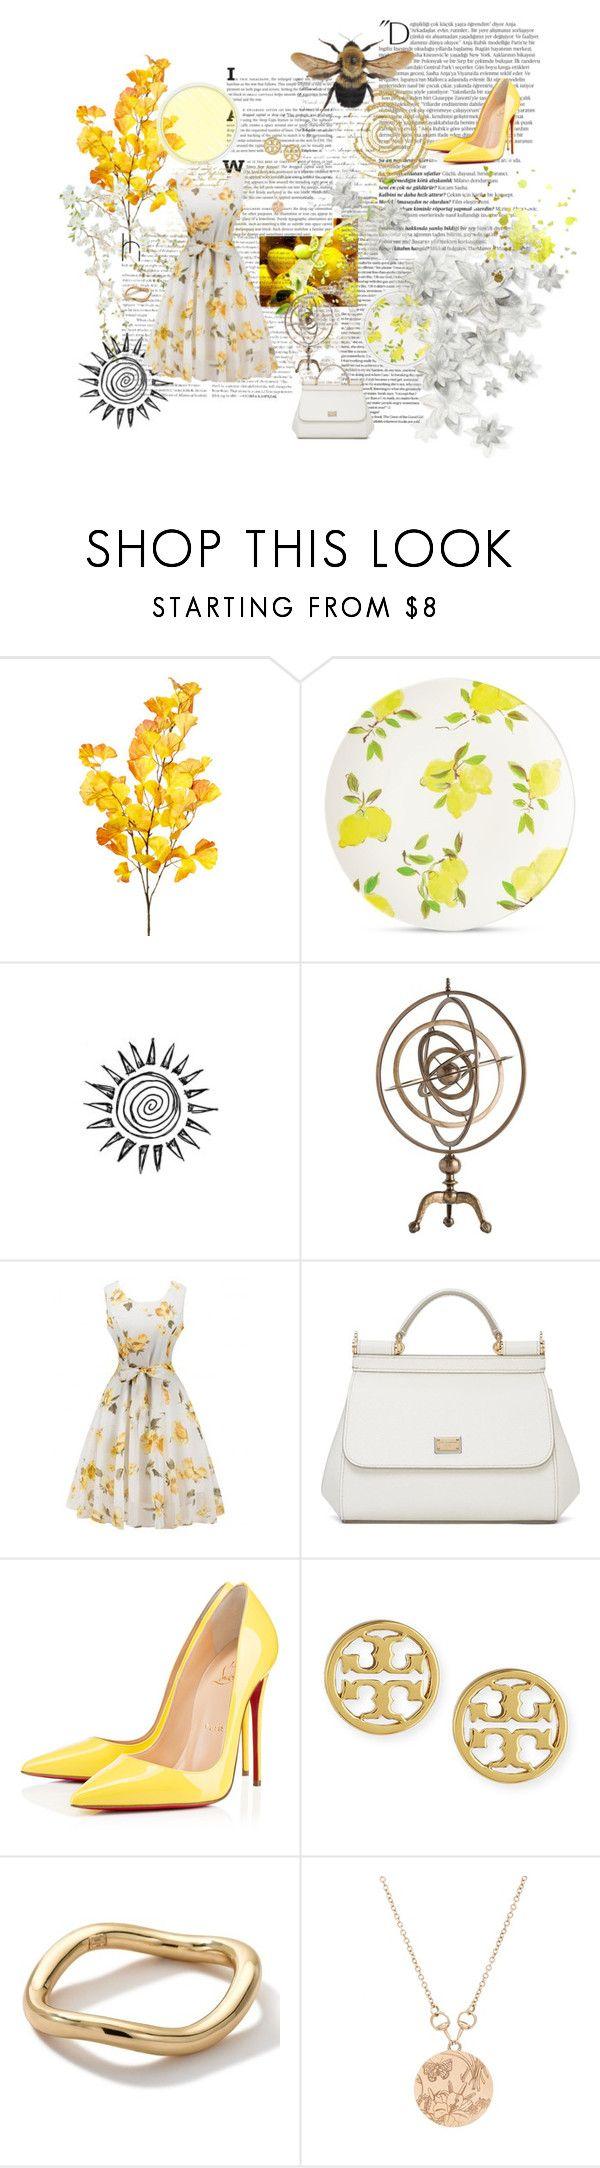 """Lemon"" by huntress-383 ❤ liked on Polyvore featuring Balmain, Kate Spade, Arteriors, Dolce&Gabbana, Christian Louboutin, Tory Burch, Ippolita and Gucci"